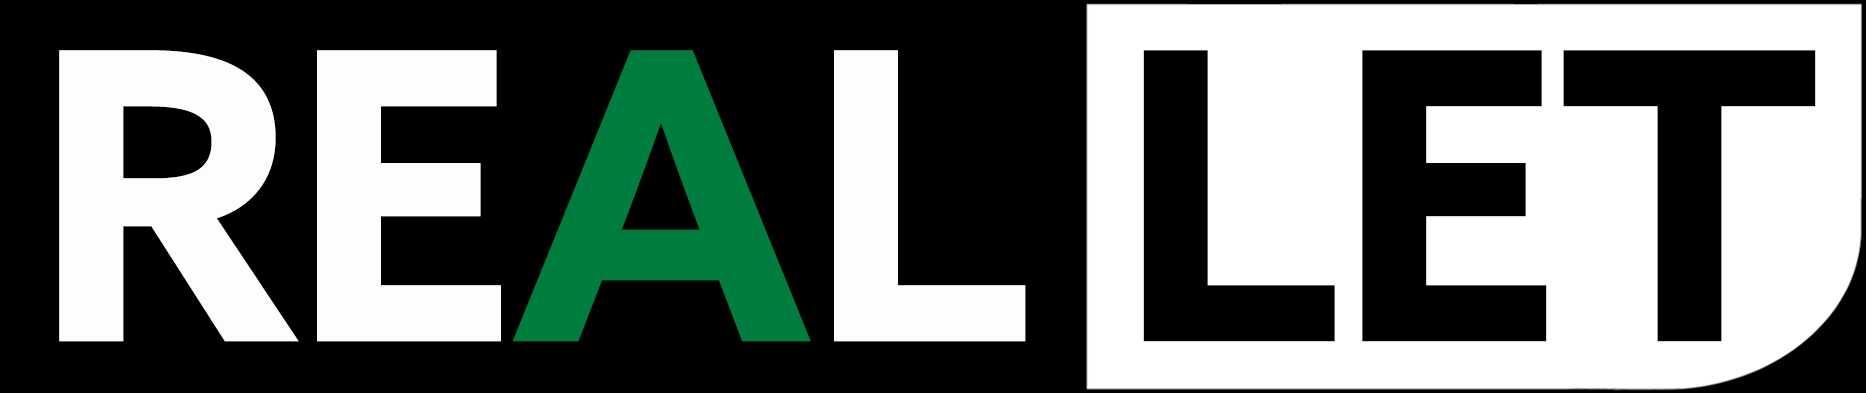 Reallet logo